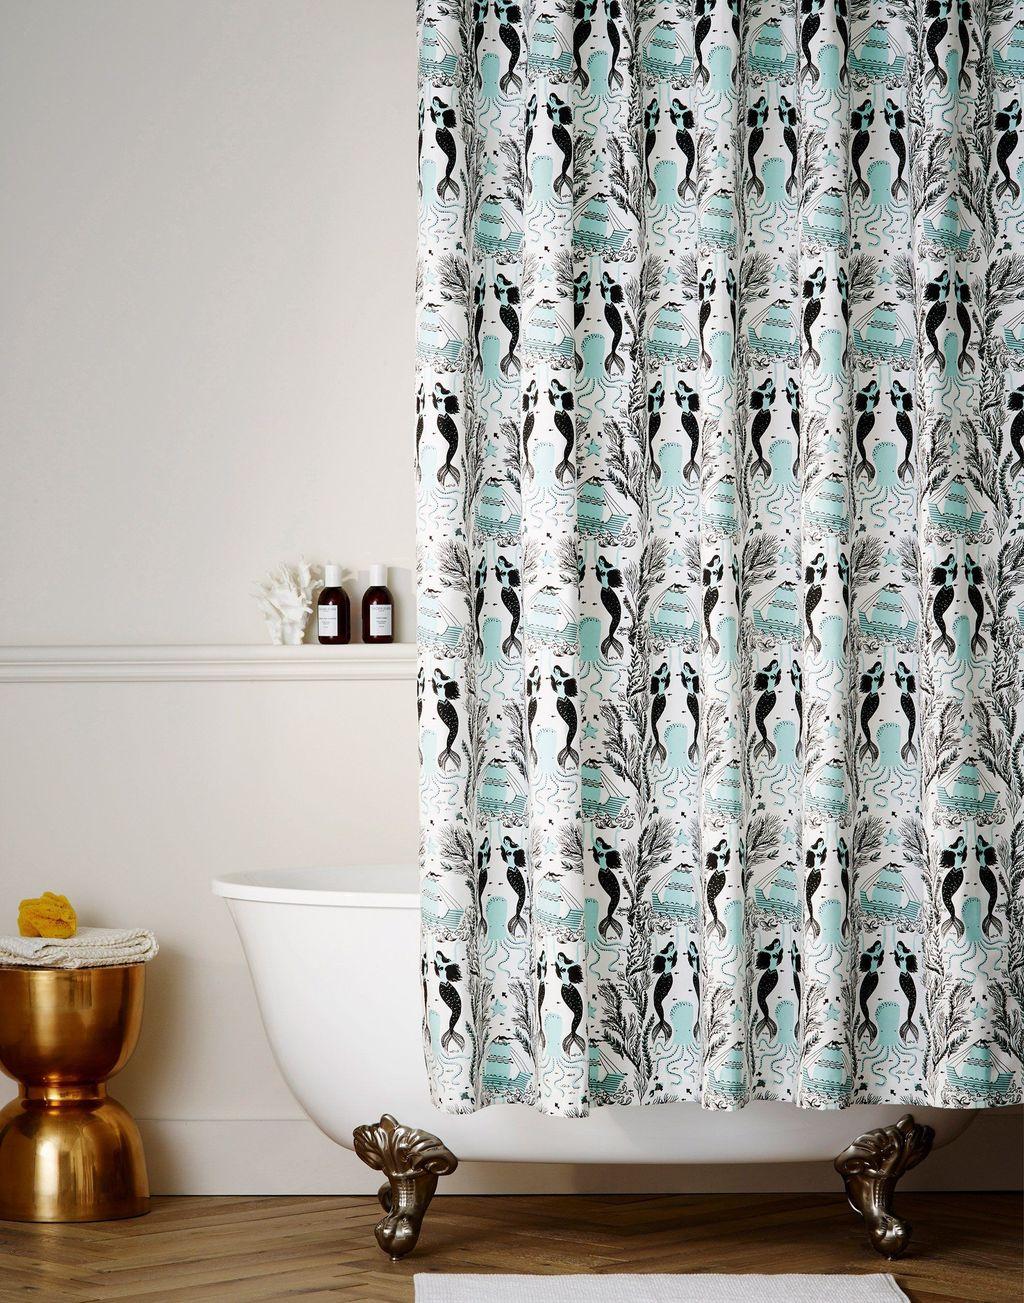 Affordable Coral Color Bathroom Decor Ideas 11